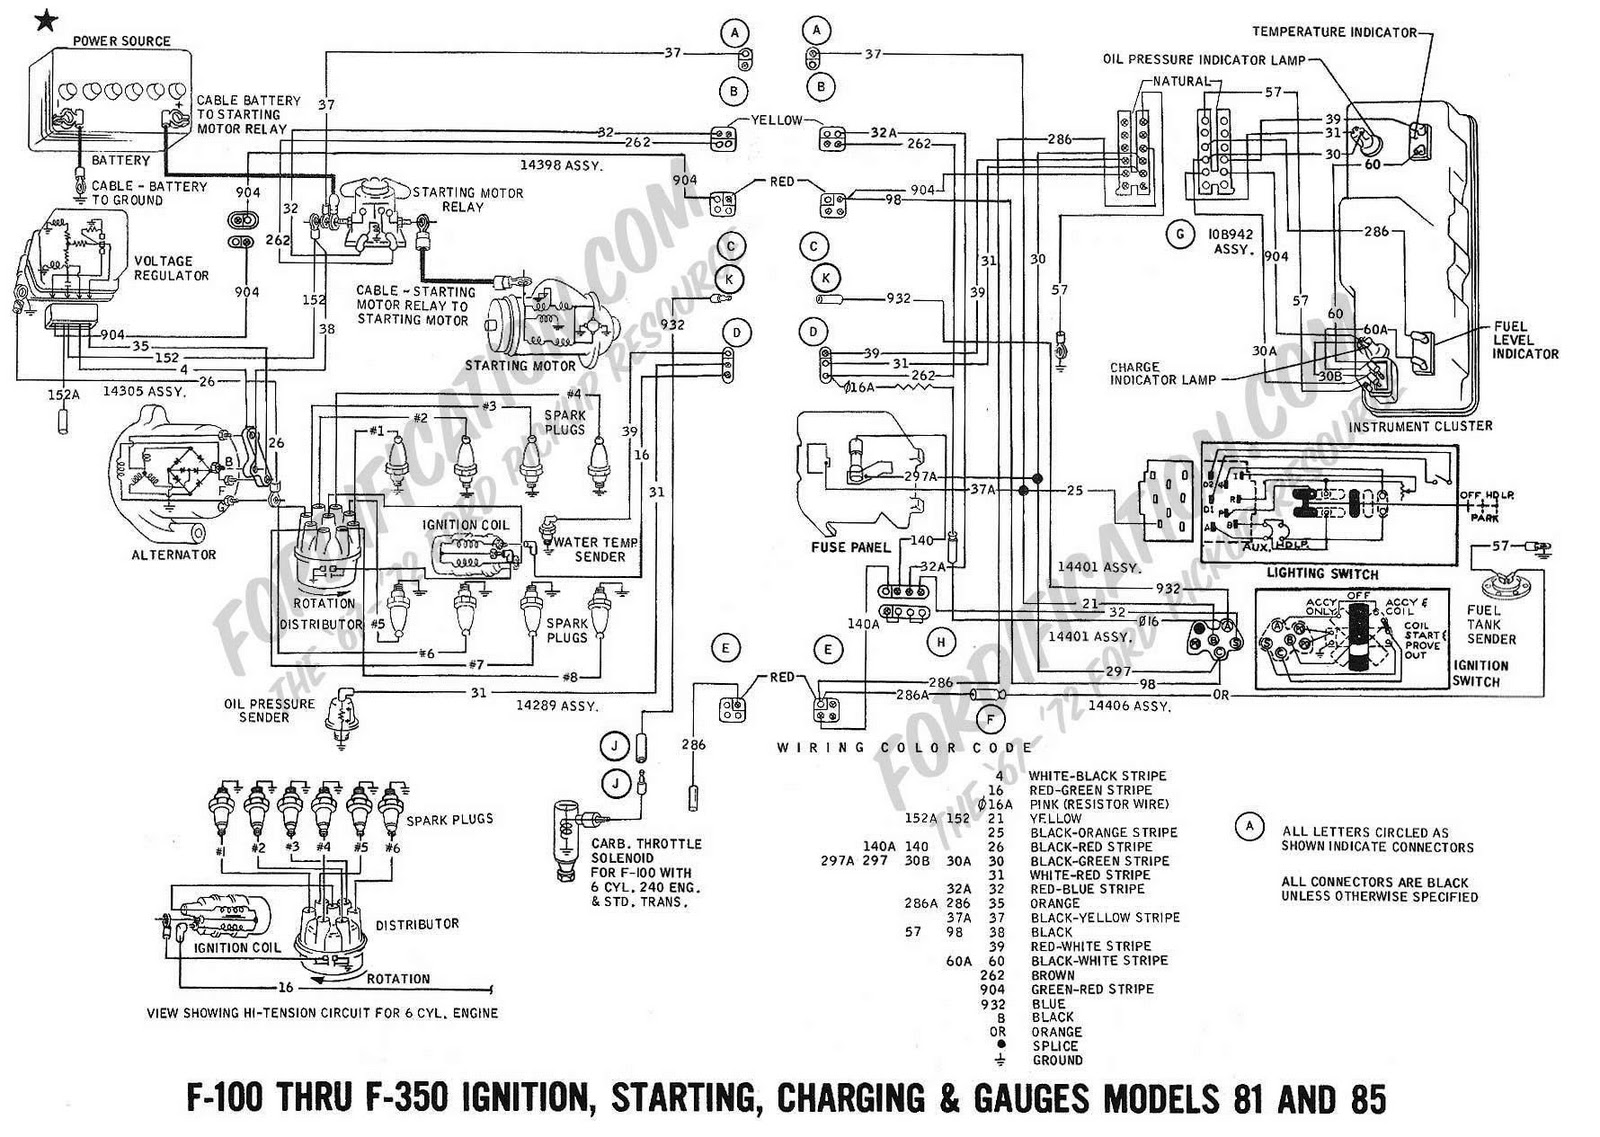 1964 galaxie 500 radio wiring diagram free wiring diagrams schematics